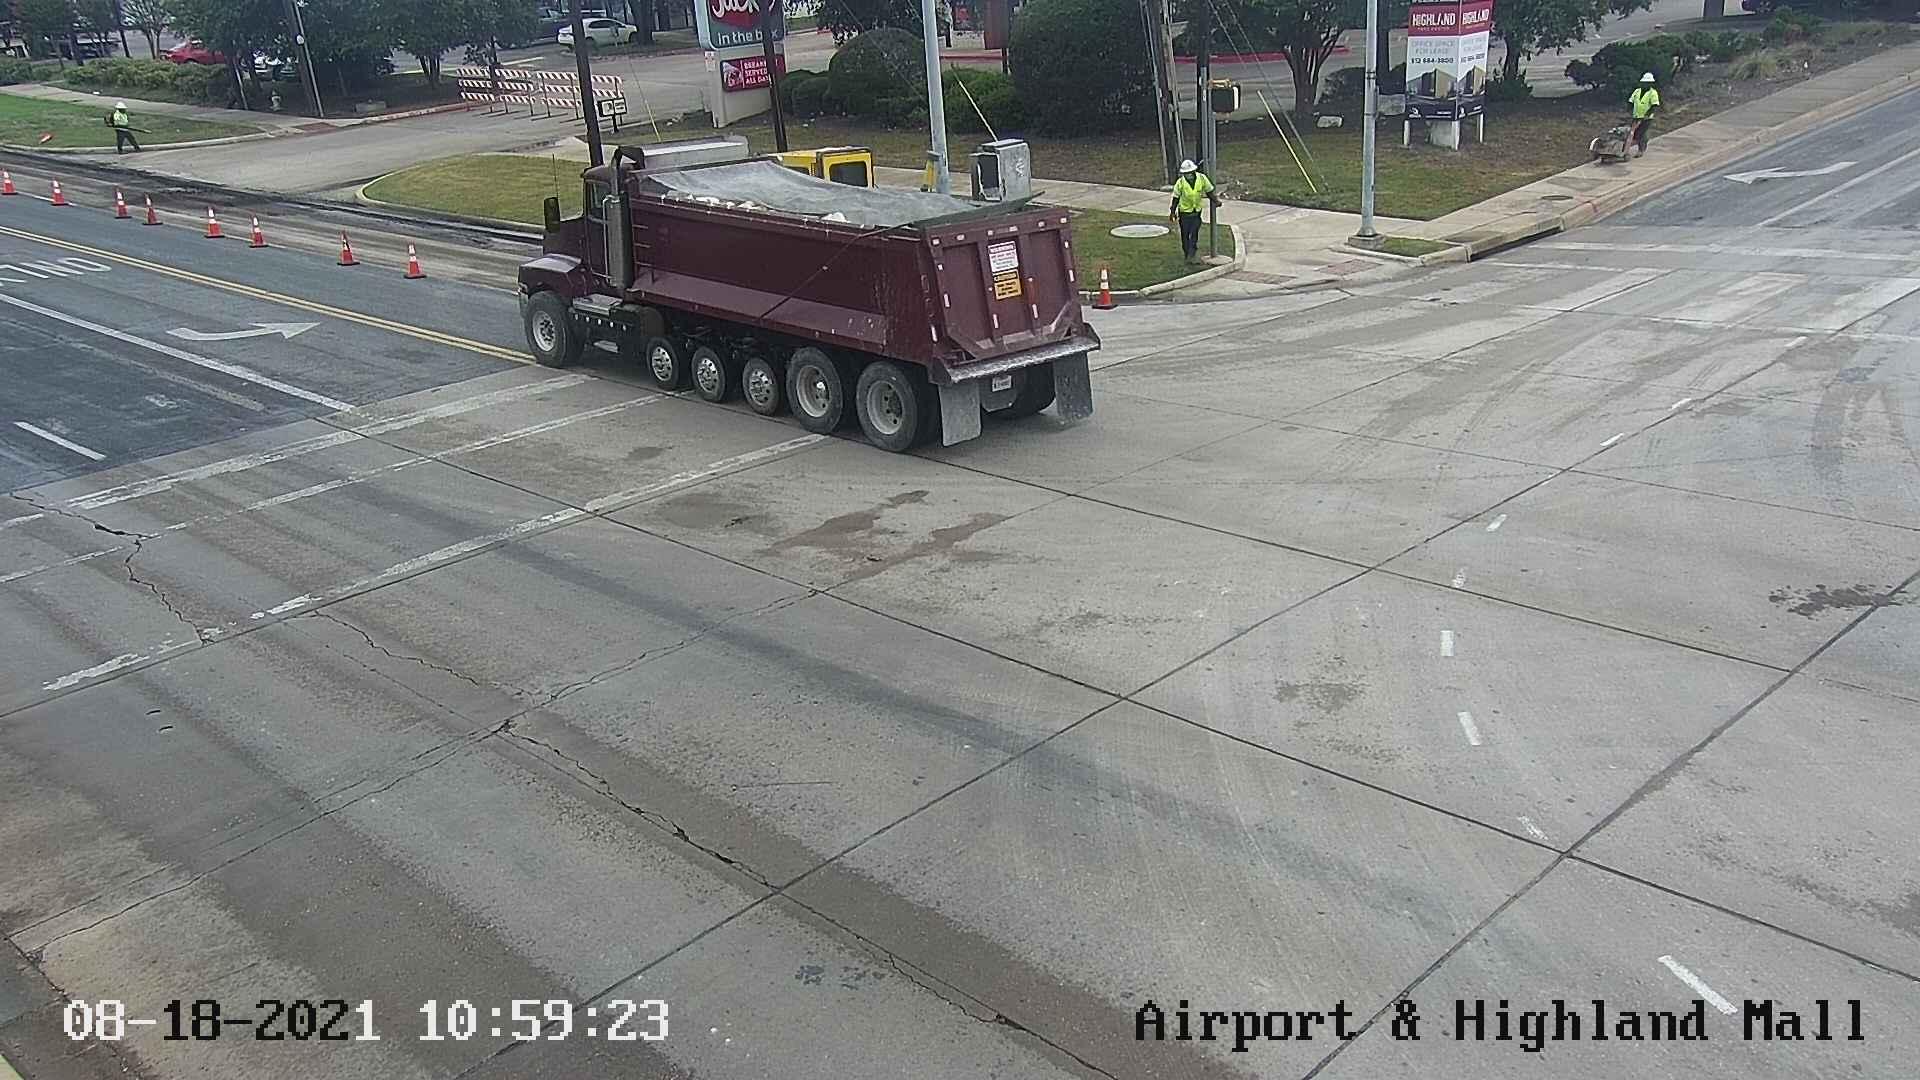 AIRPORT BLVD / HIGHLAND MALL BLVD